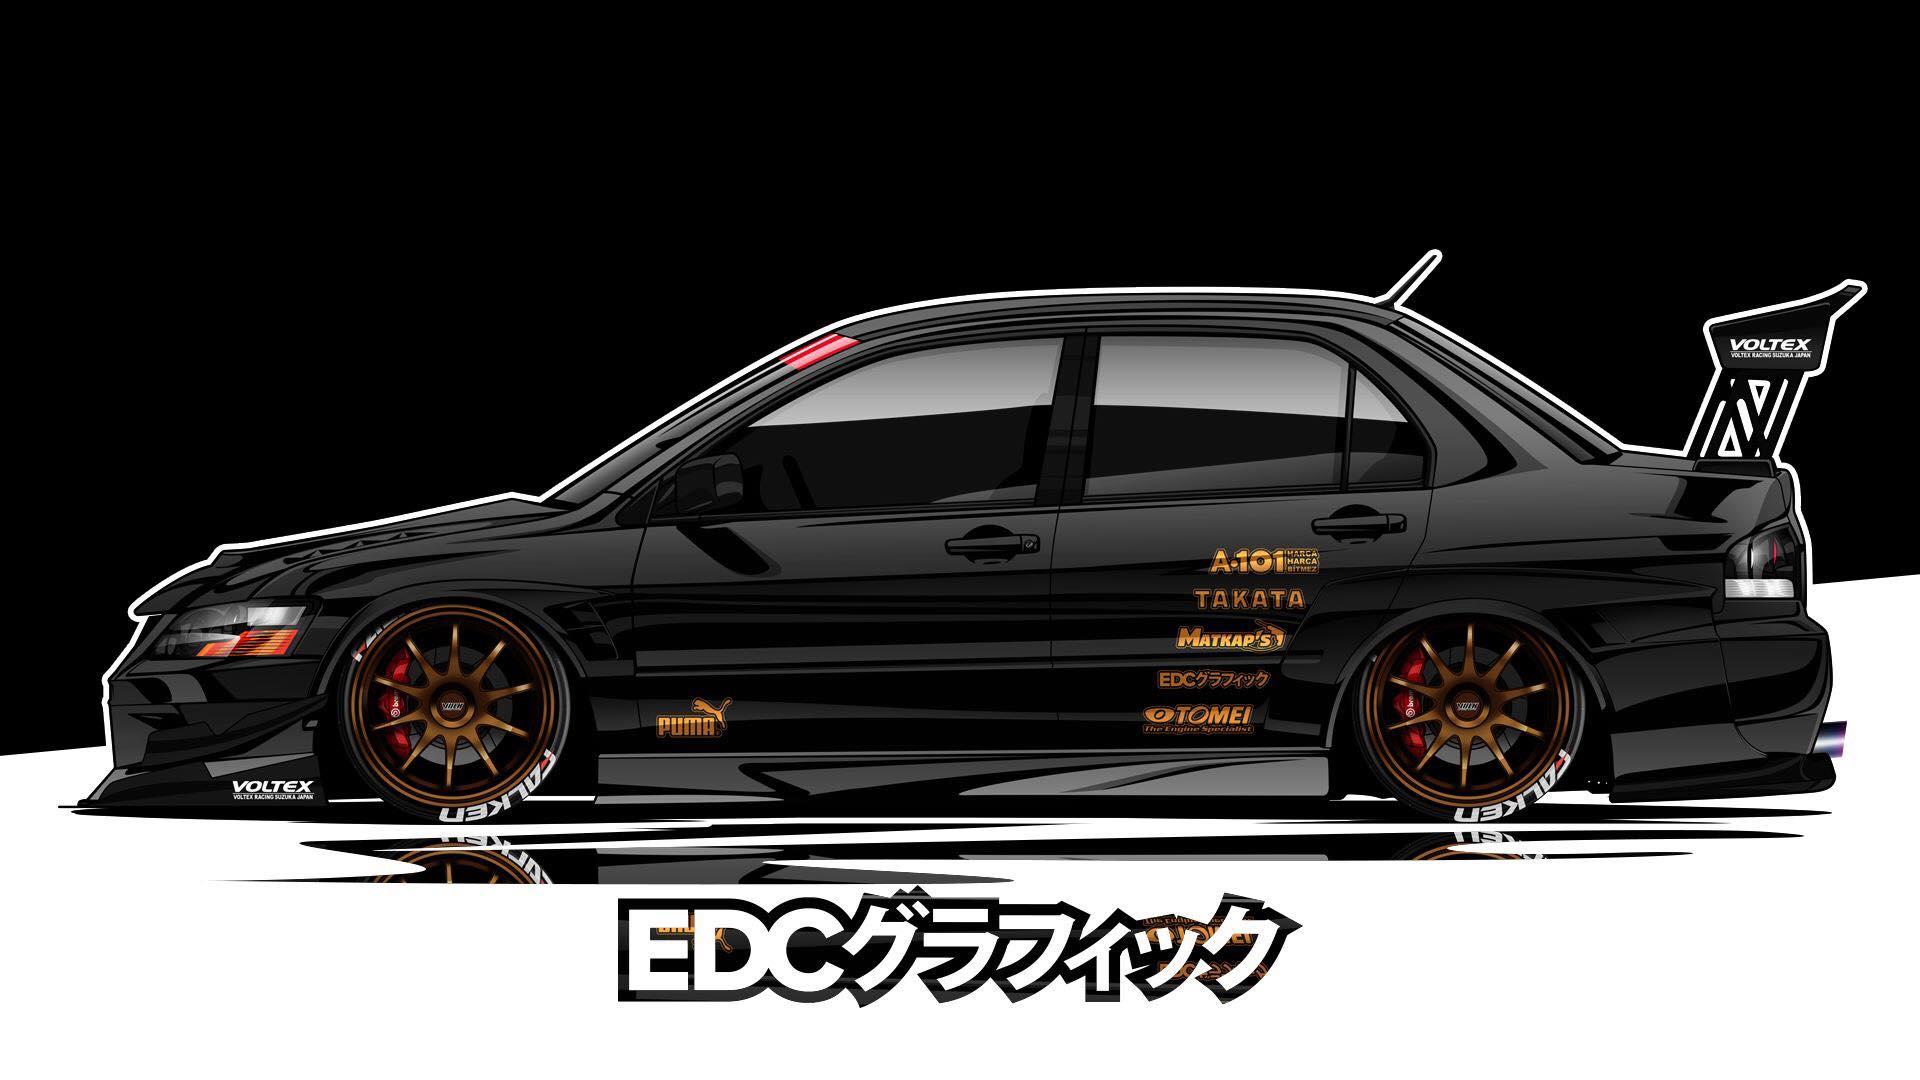 Edc graphics mitsubishi lancer evolution jdm render car artwork black cars vehicle